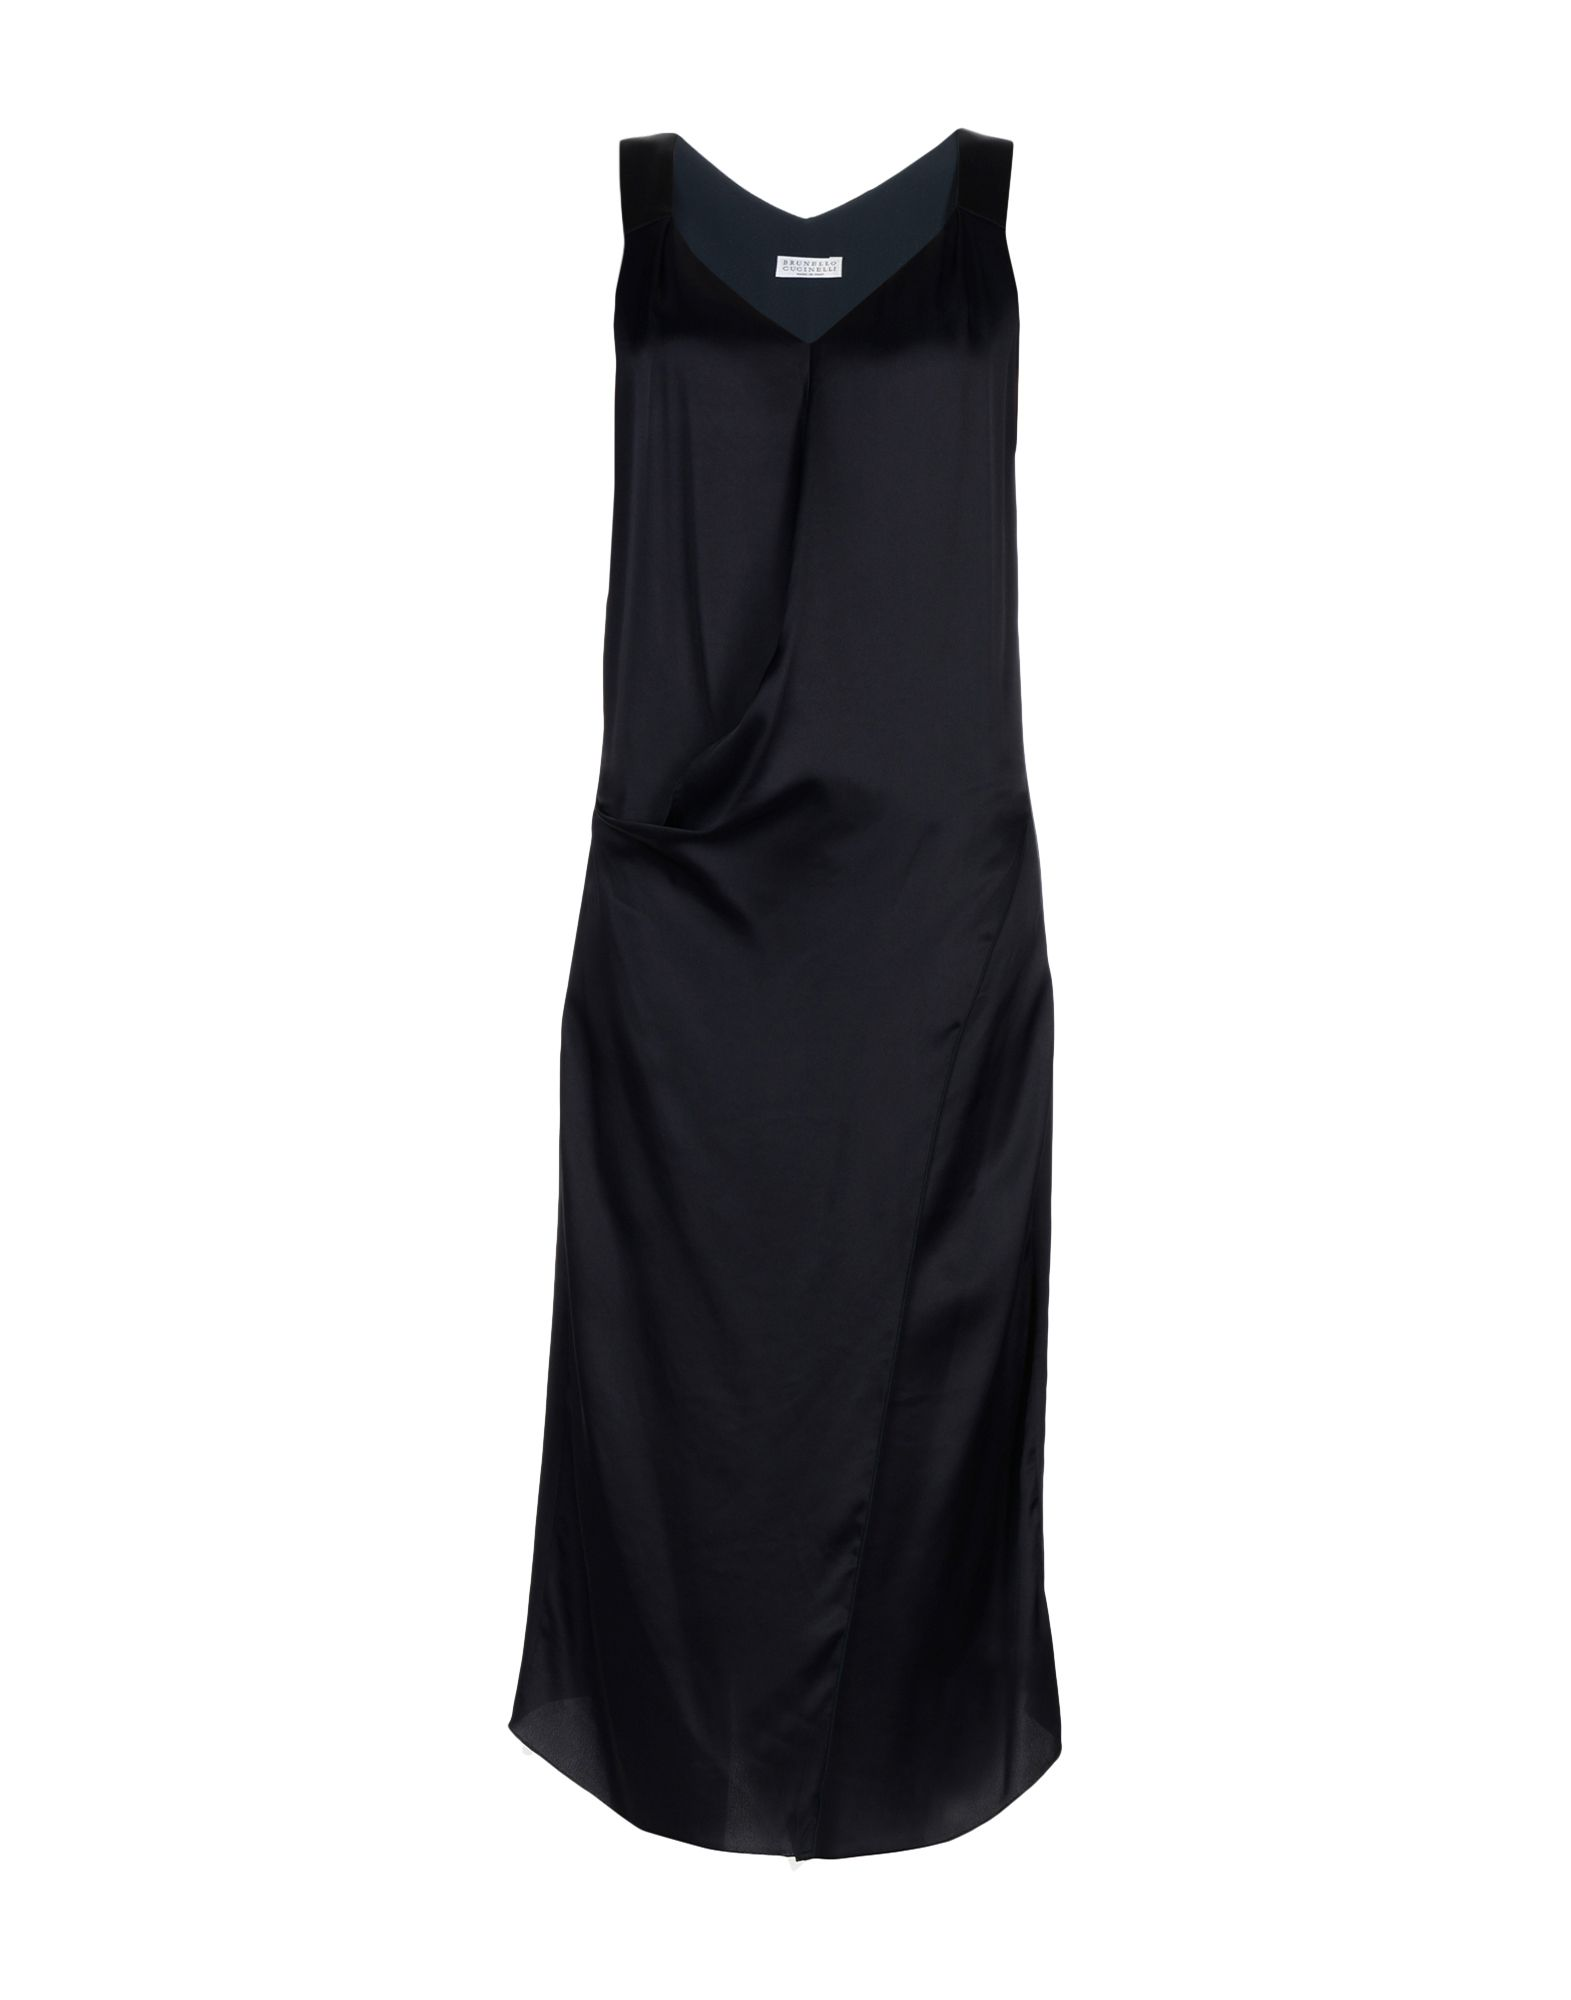 BRUNELLO CUCINELLI Платье длиной 3/4 lisa corti платье длиной 3 4